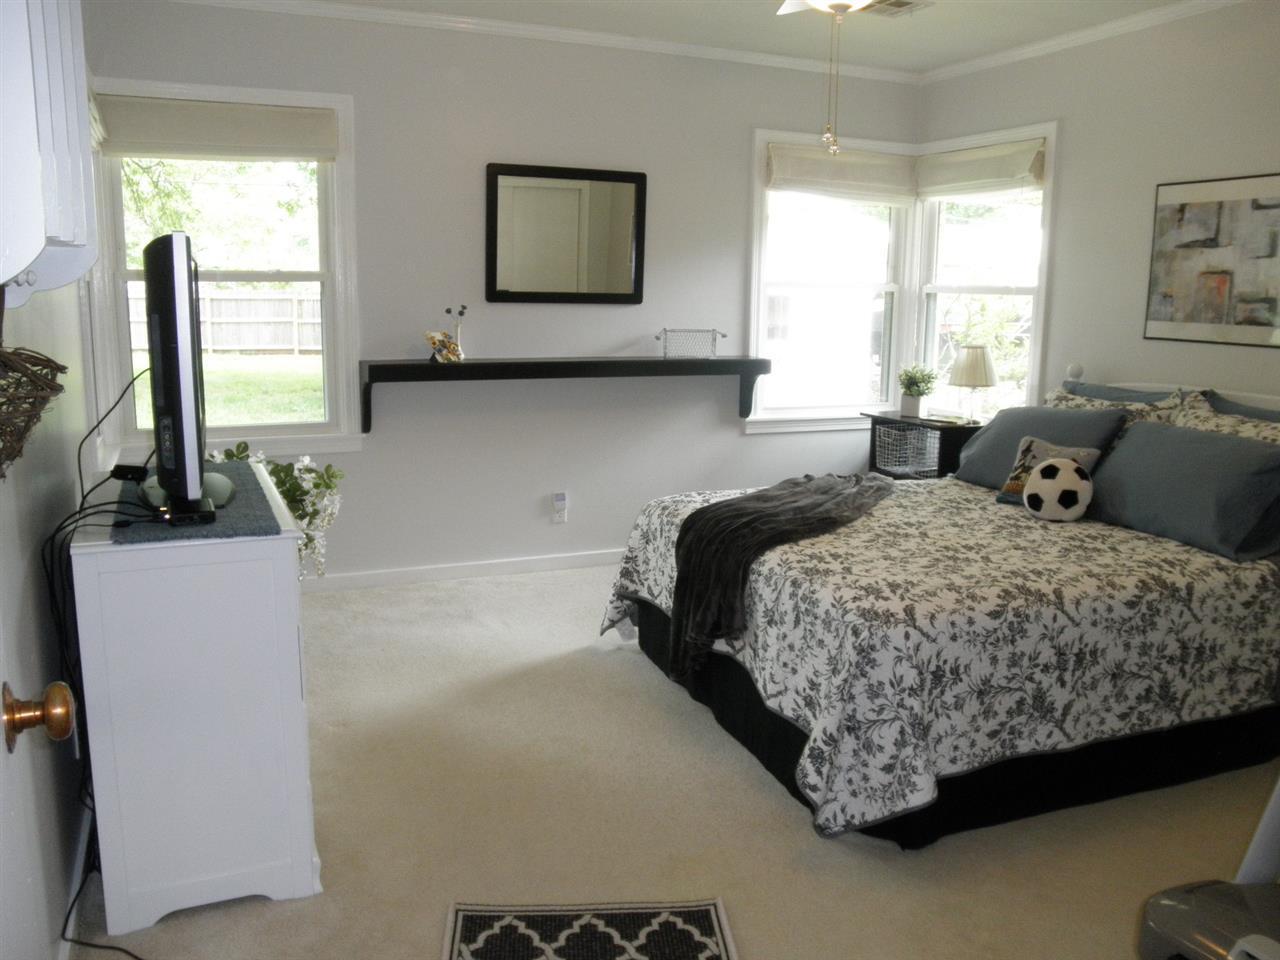 Sold Cross Sale W/ MLS | 127 Fairview  Ponca City, OK 74601 24